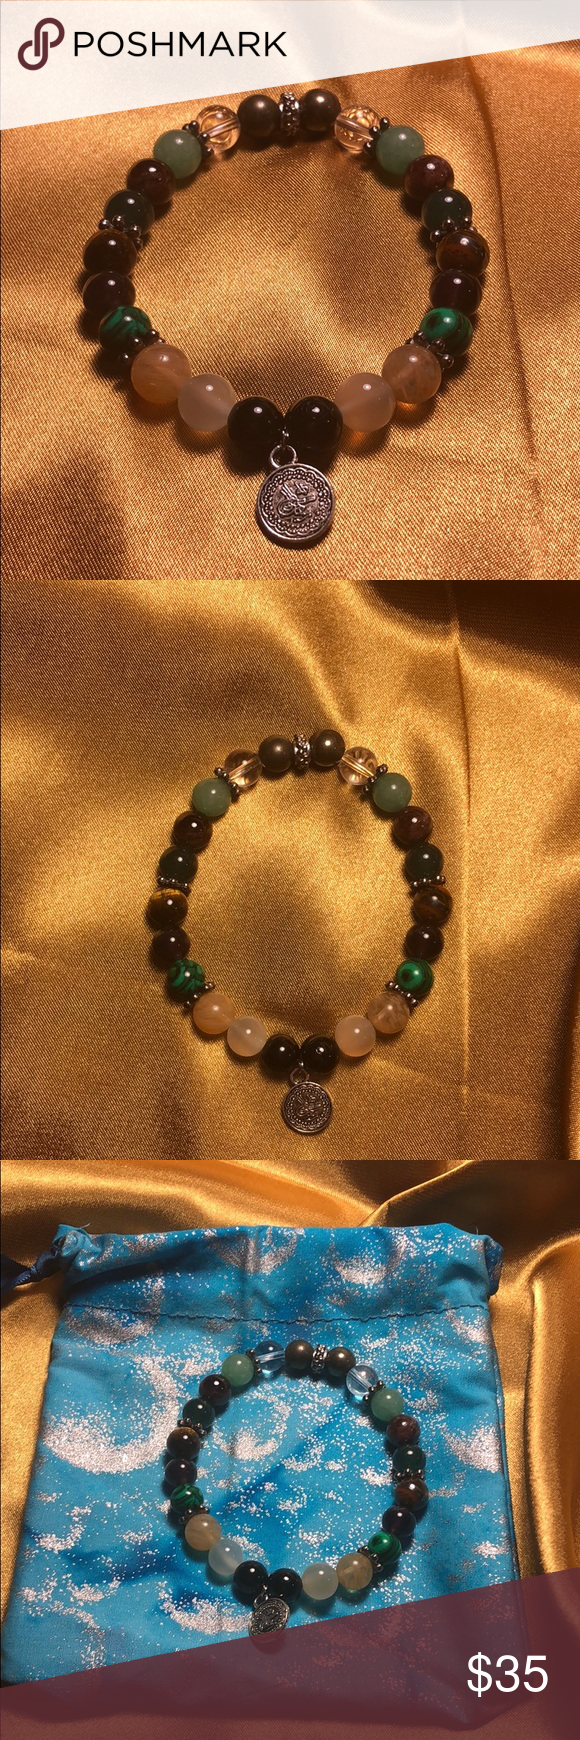 Photo of Bracelet for manifesting wealth with handmade bag Black tourmaline protection. M…